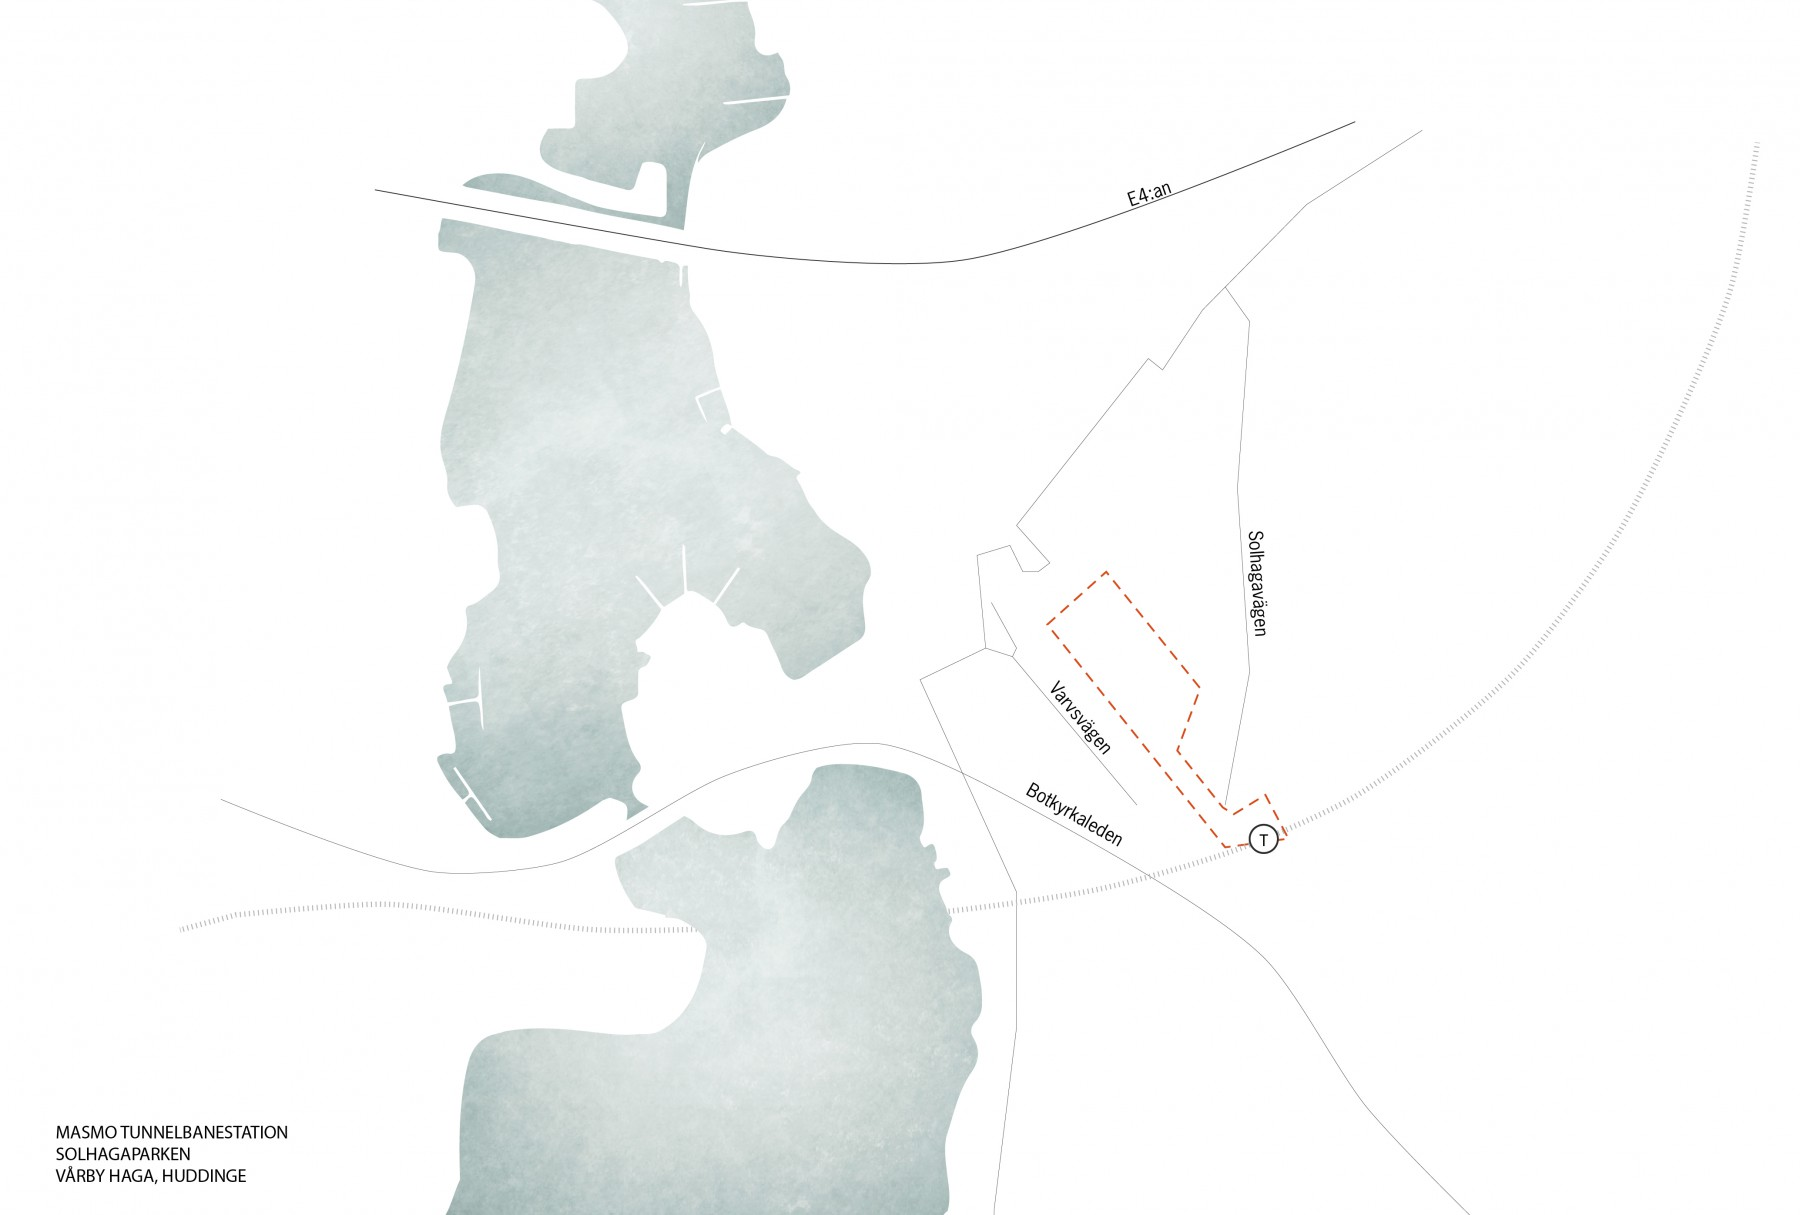 masmo_solhagaparken_LAND_2012-2013_karta-01